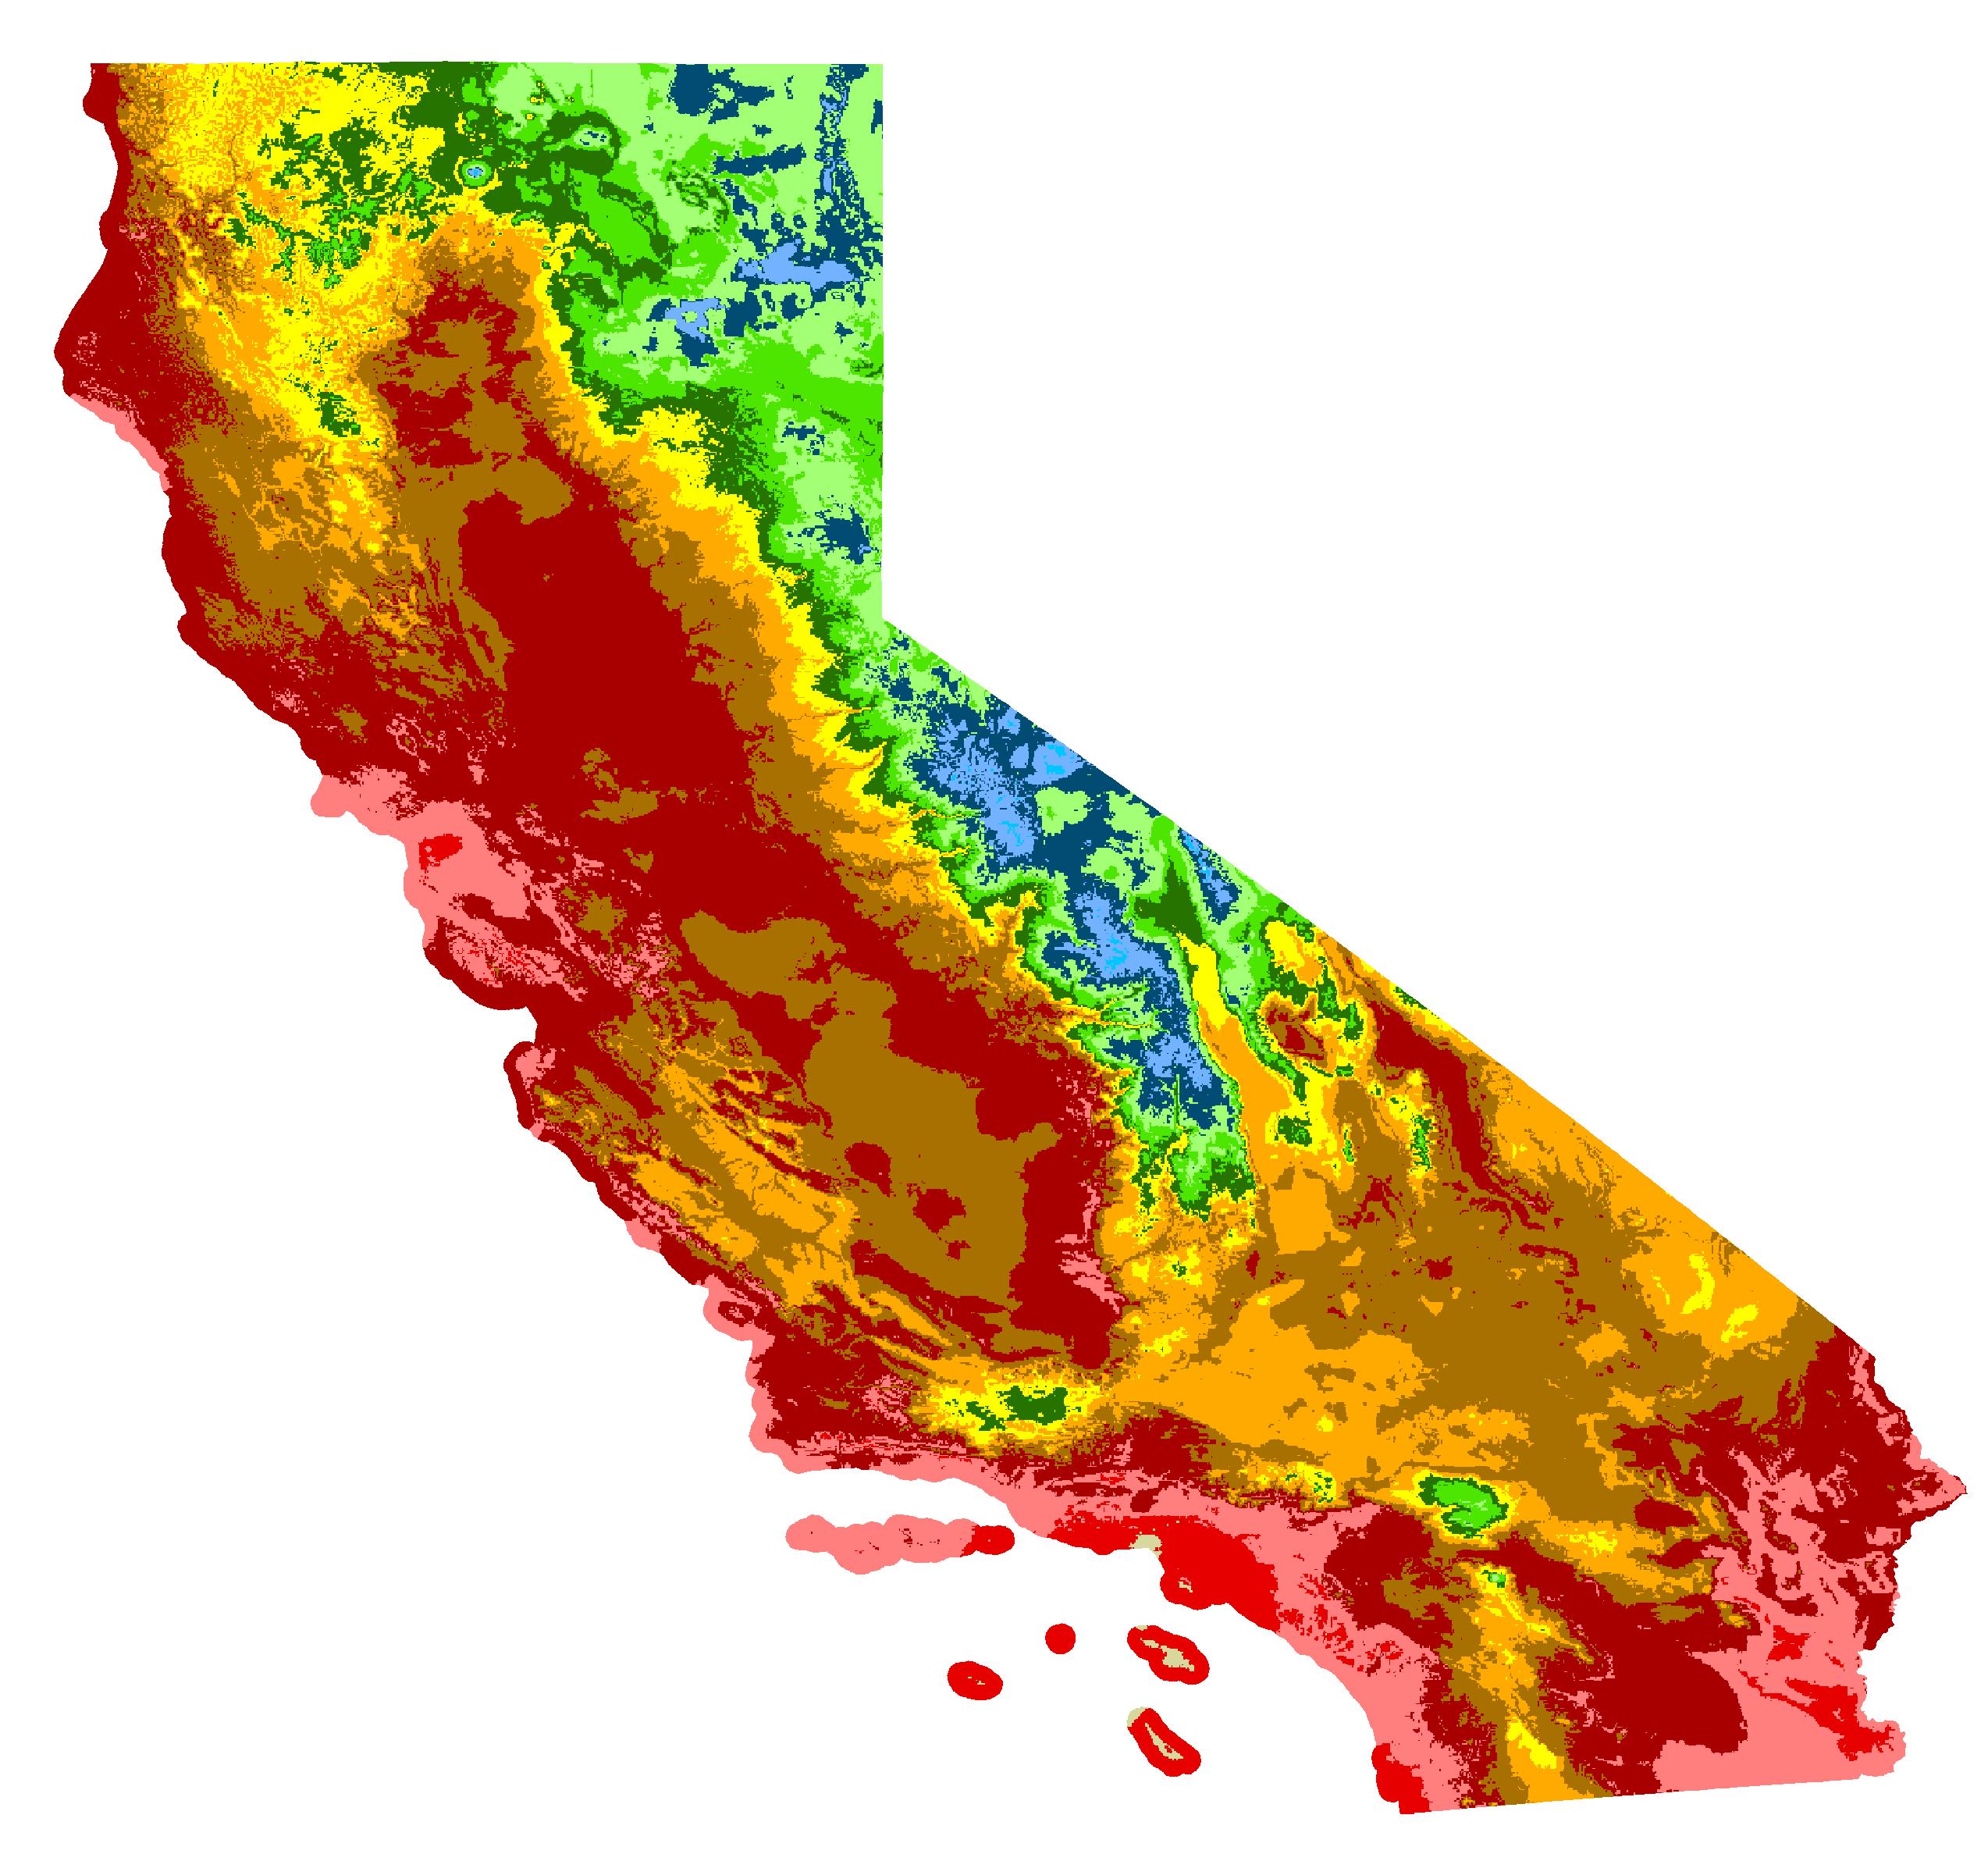 Morada, California Hardiness Zones